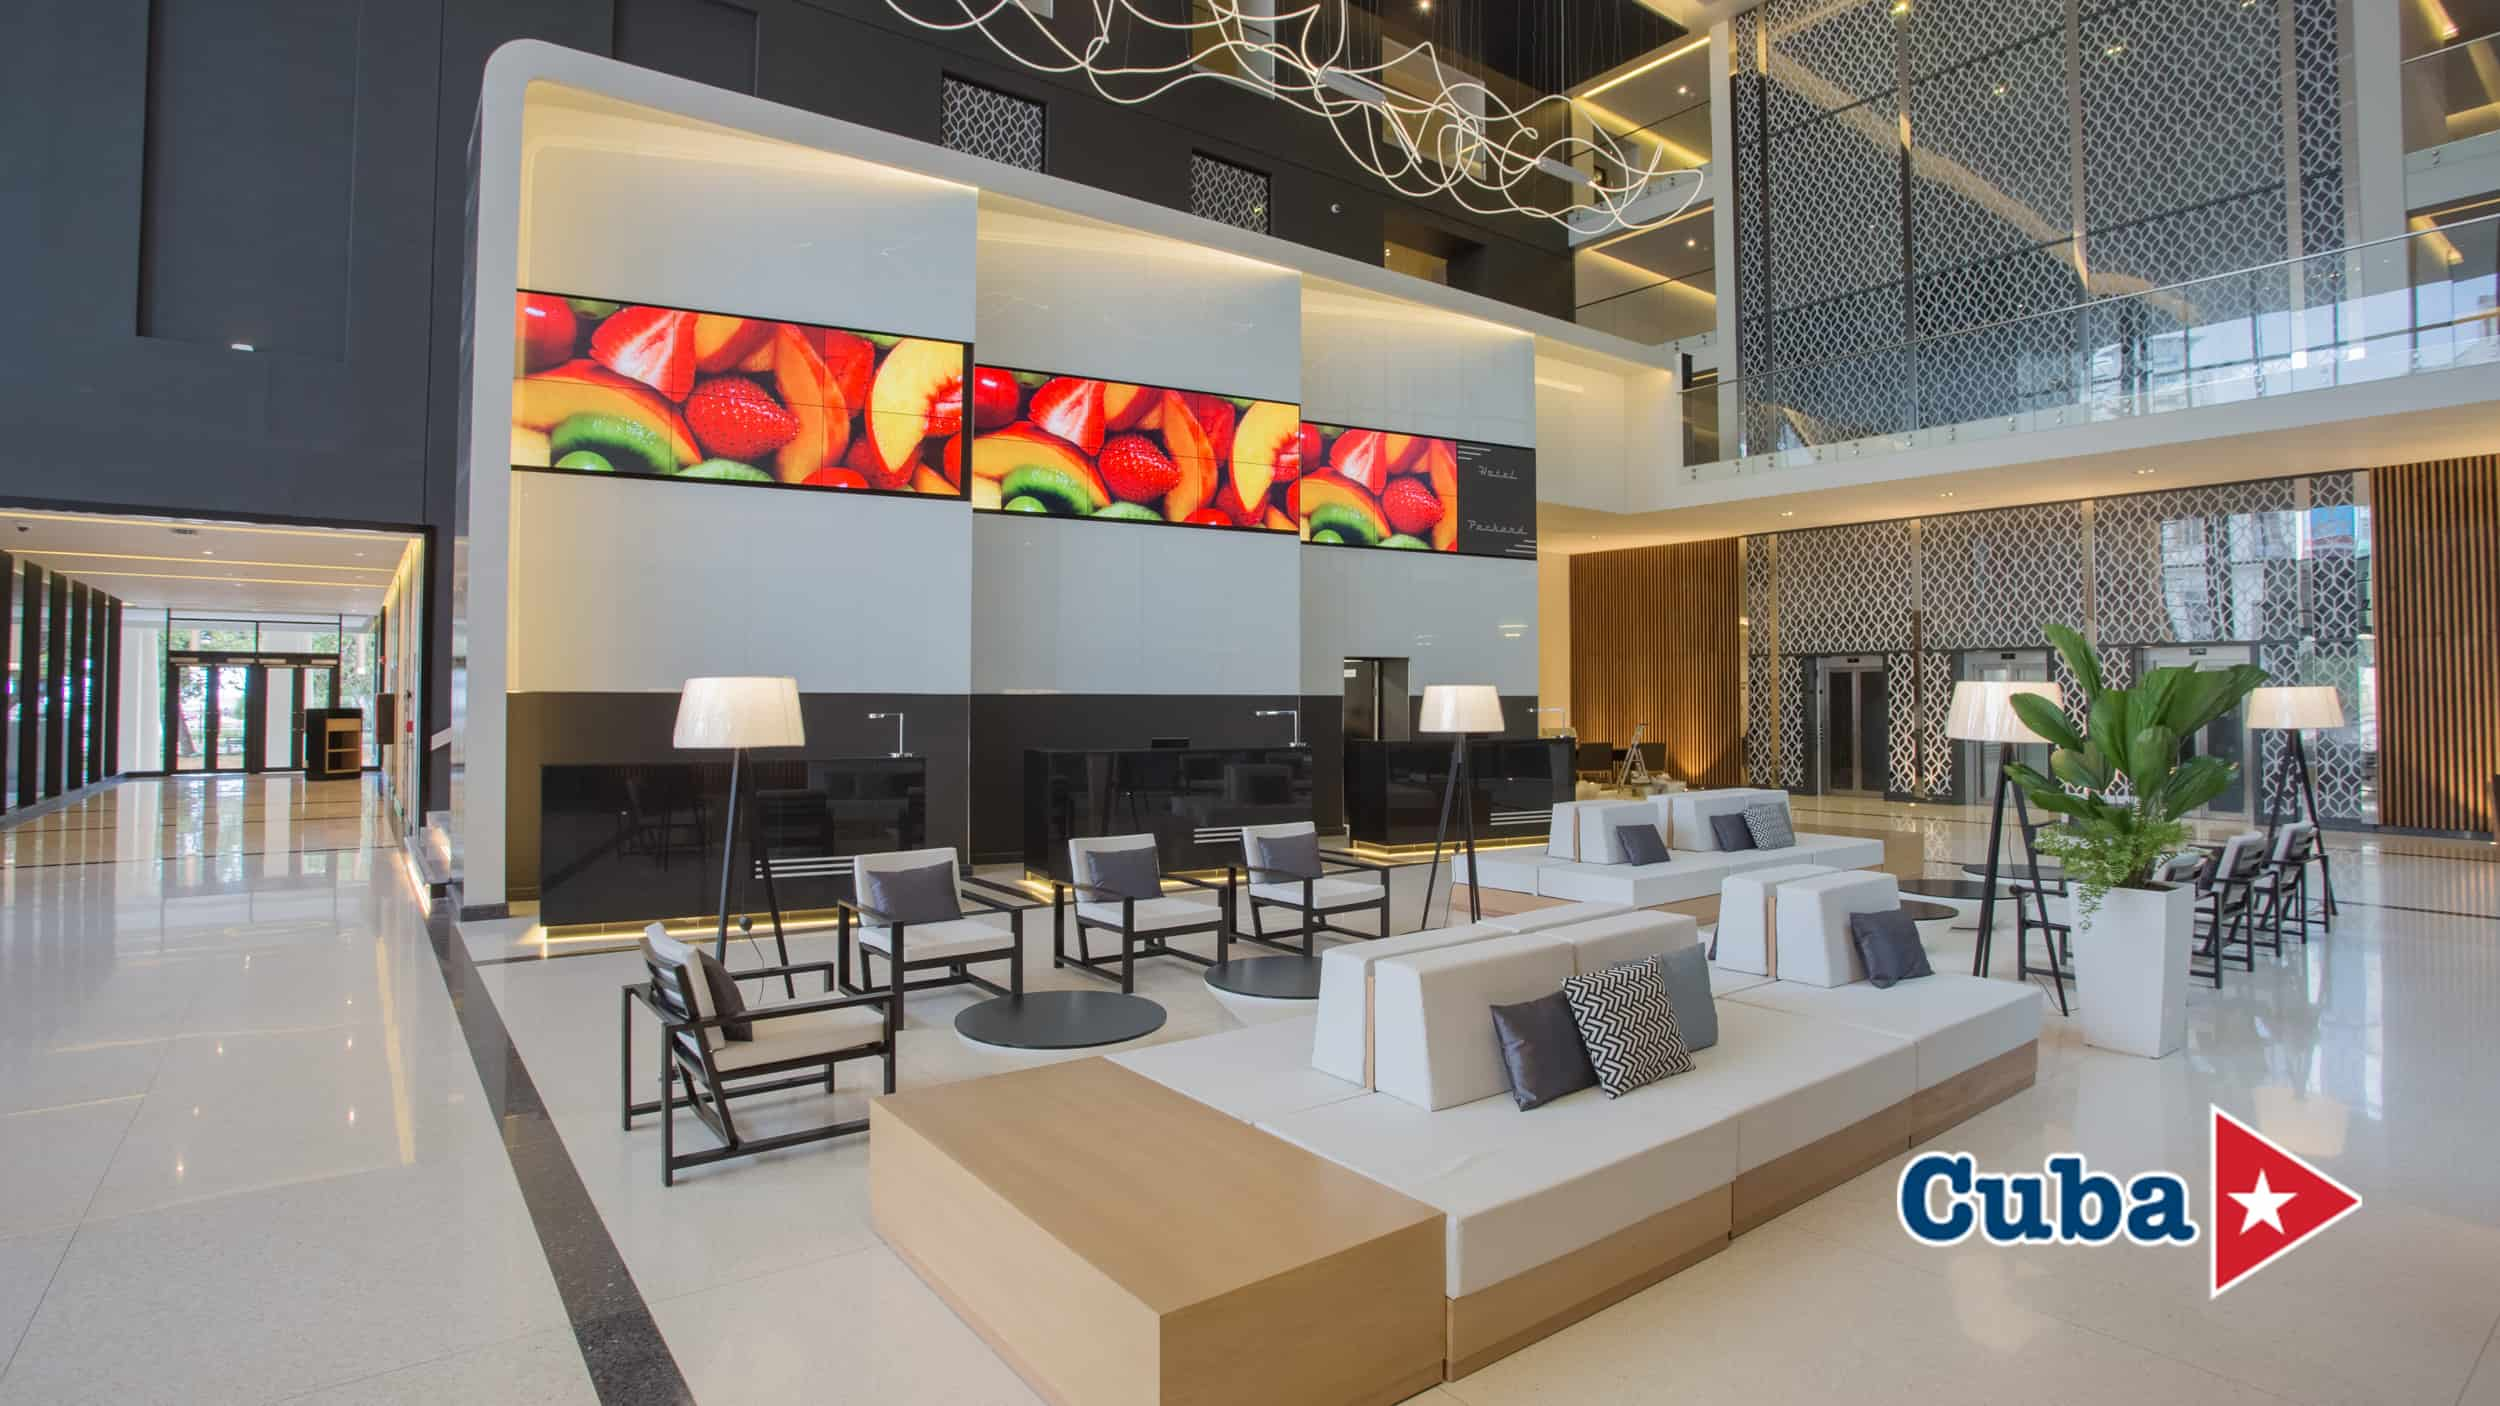 Lobby of Iberostar Grand Packard Hotel